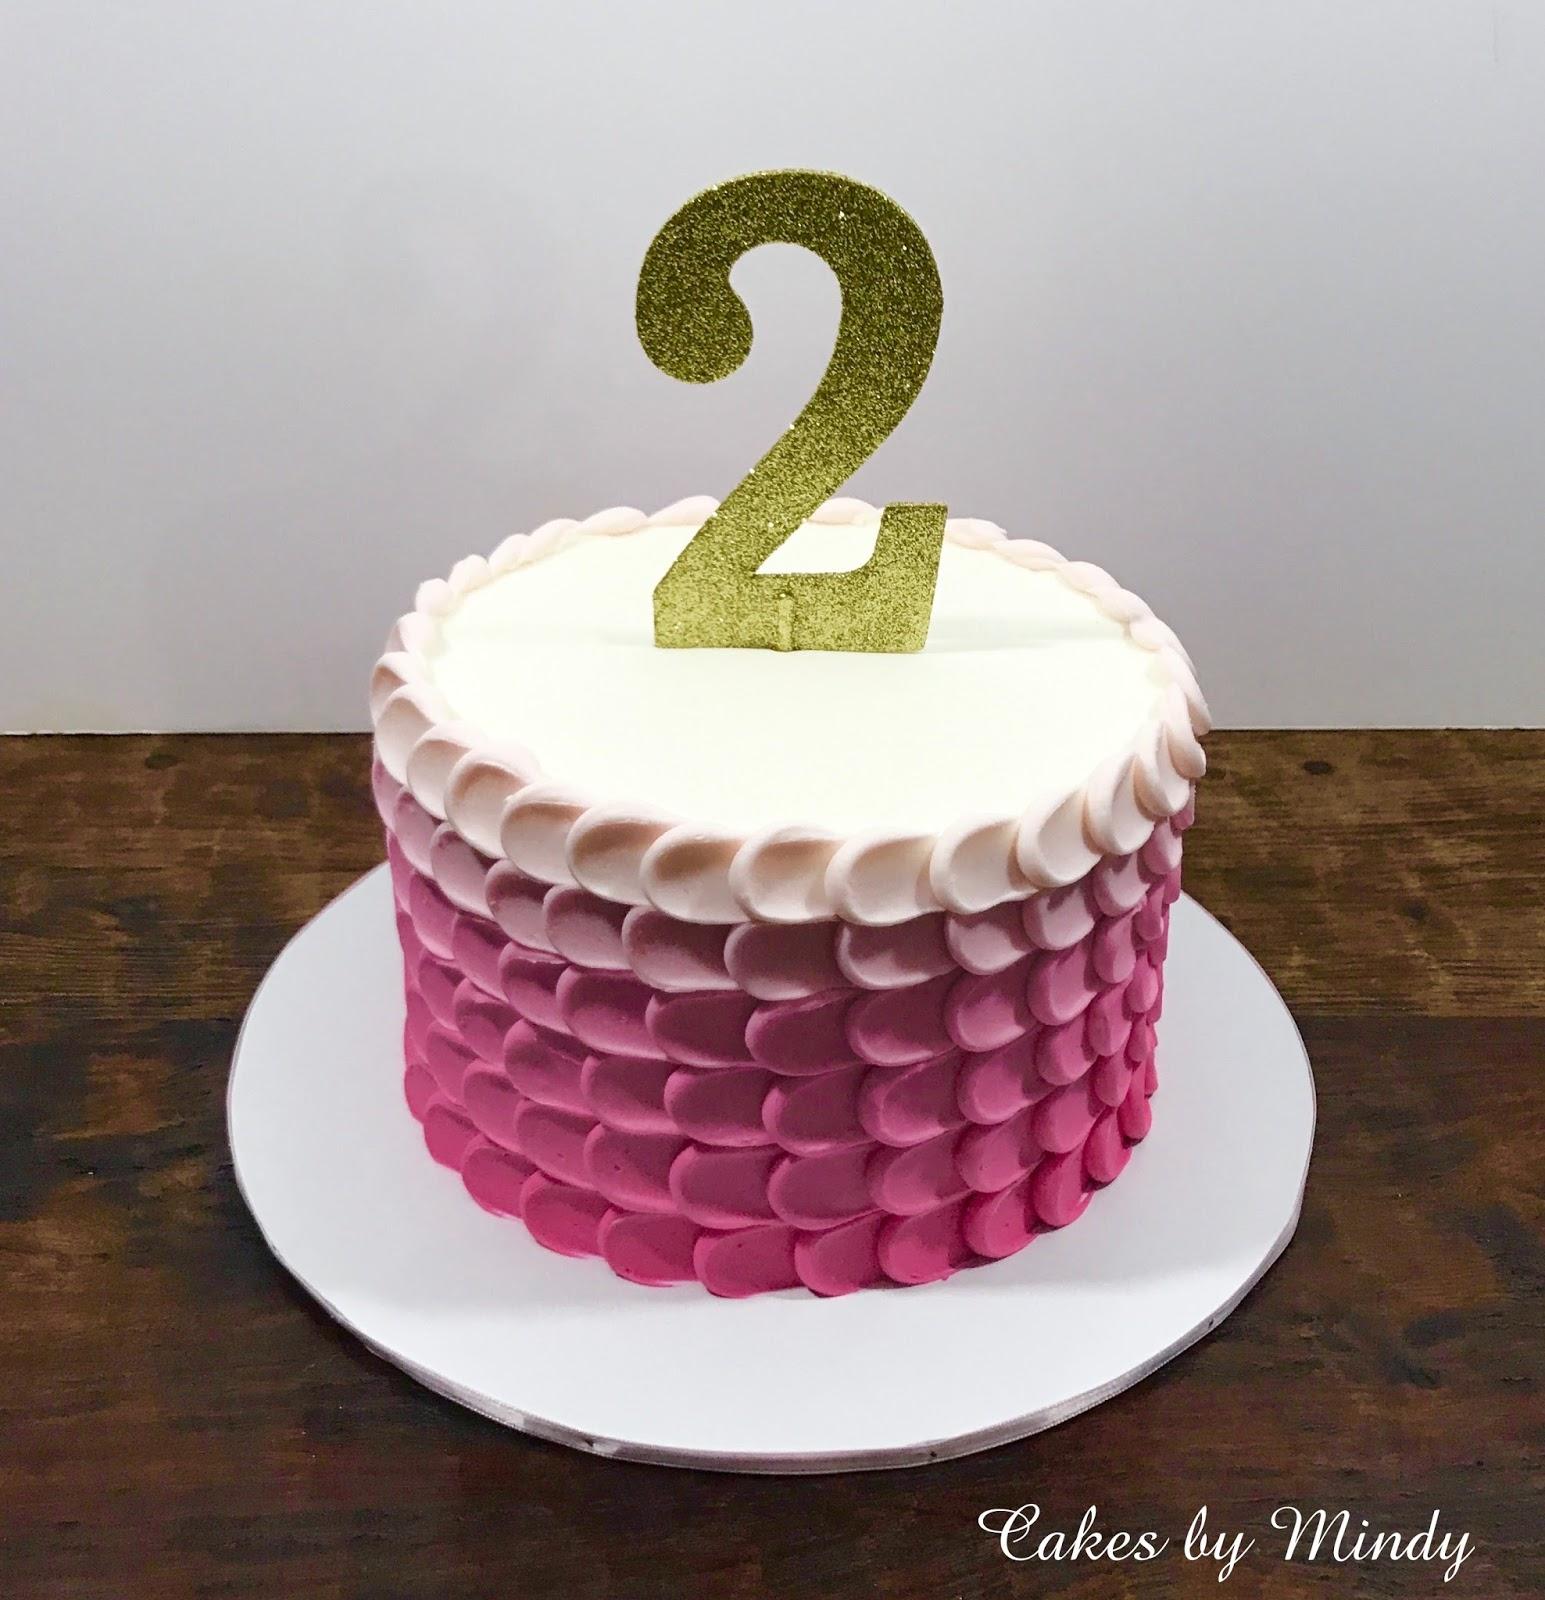 Wondrous Cakes By Mindy Pink Ombre Birthday Cake 6 Funny Birthday Cards Online Inifodamsfinfo